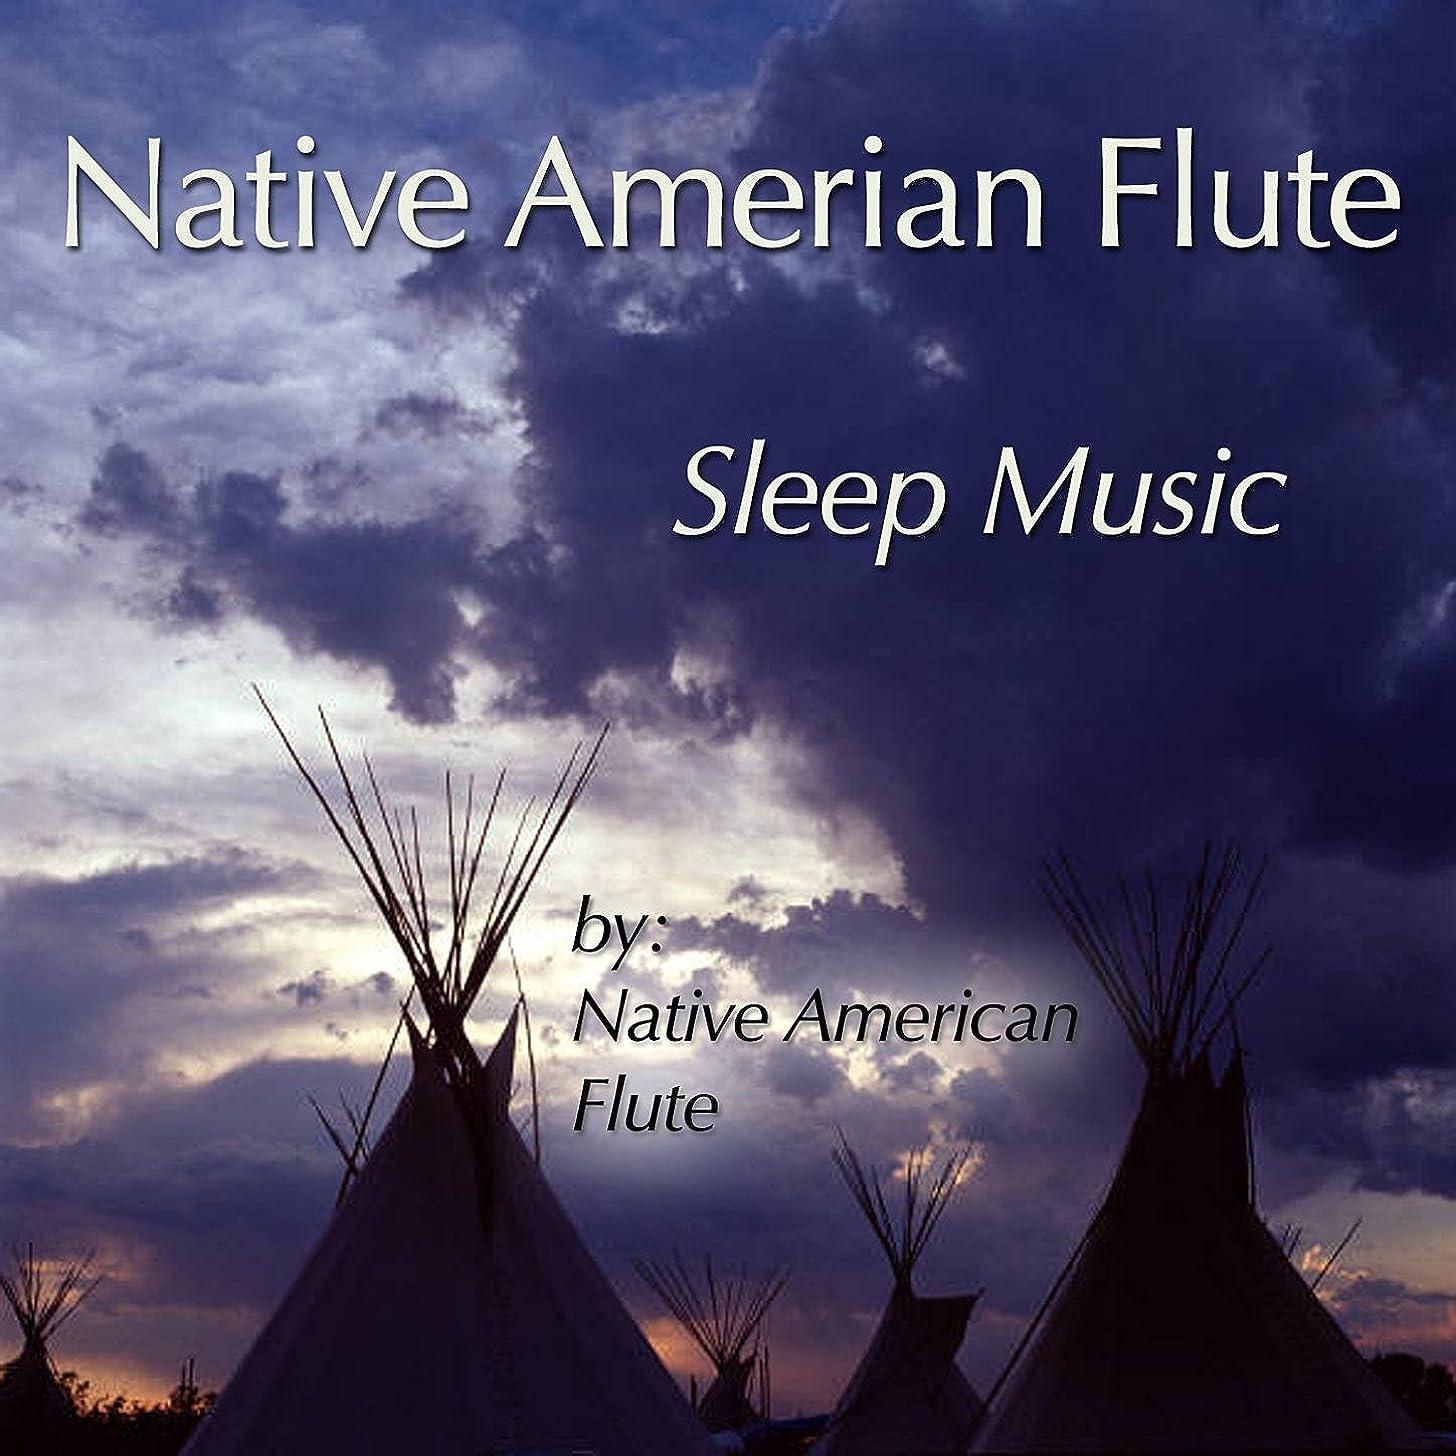 Native American Flute: Sleep Music